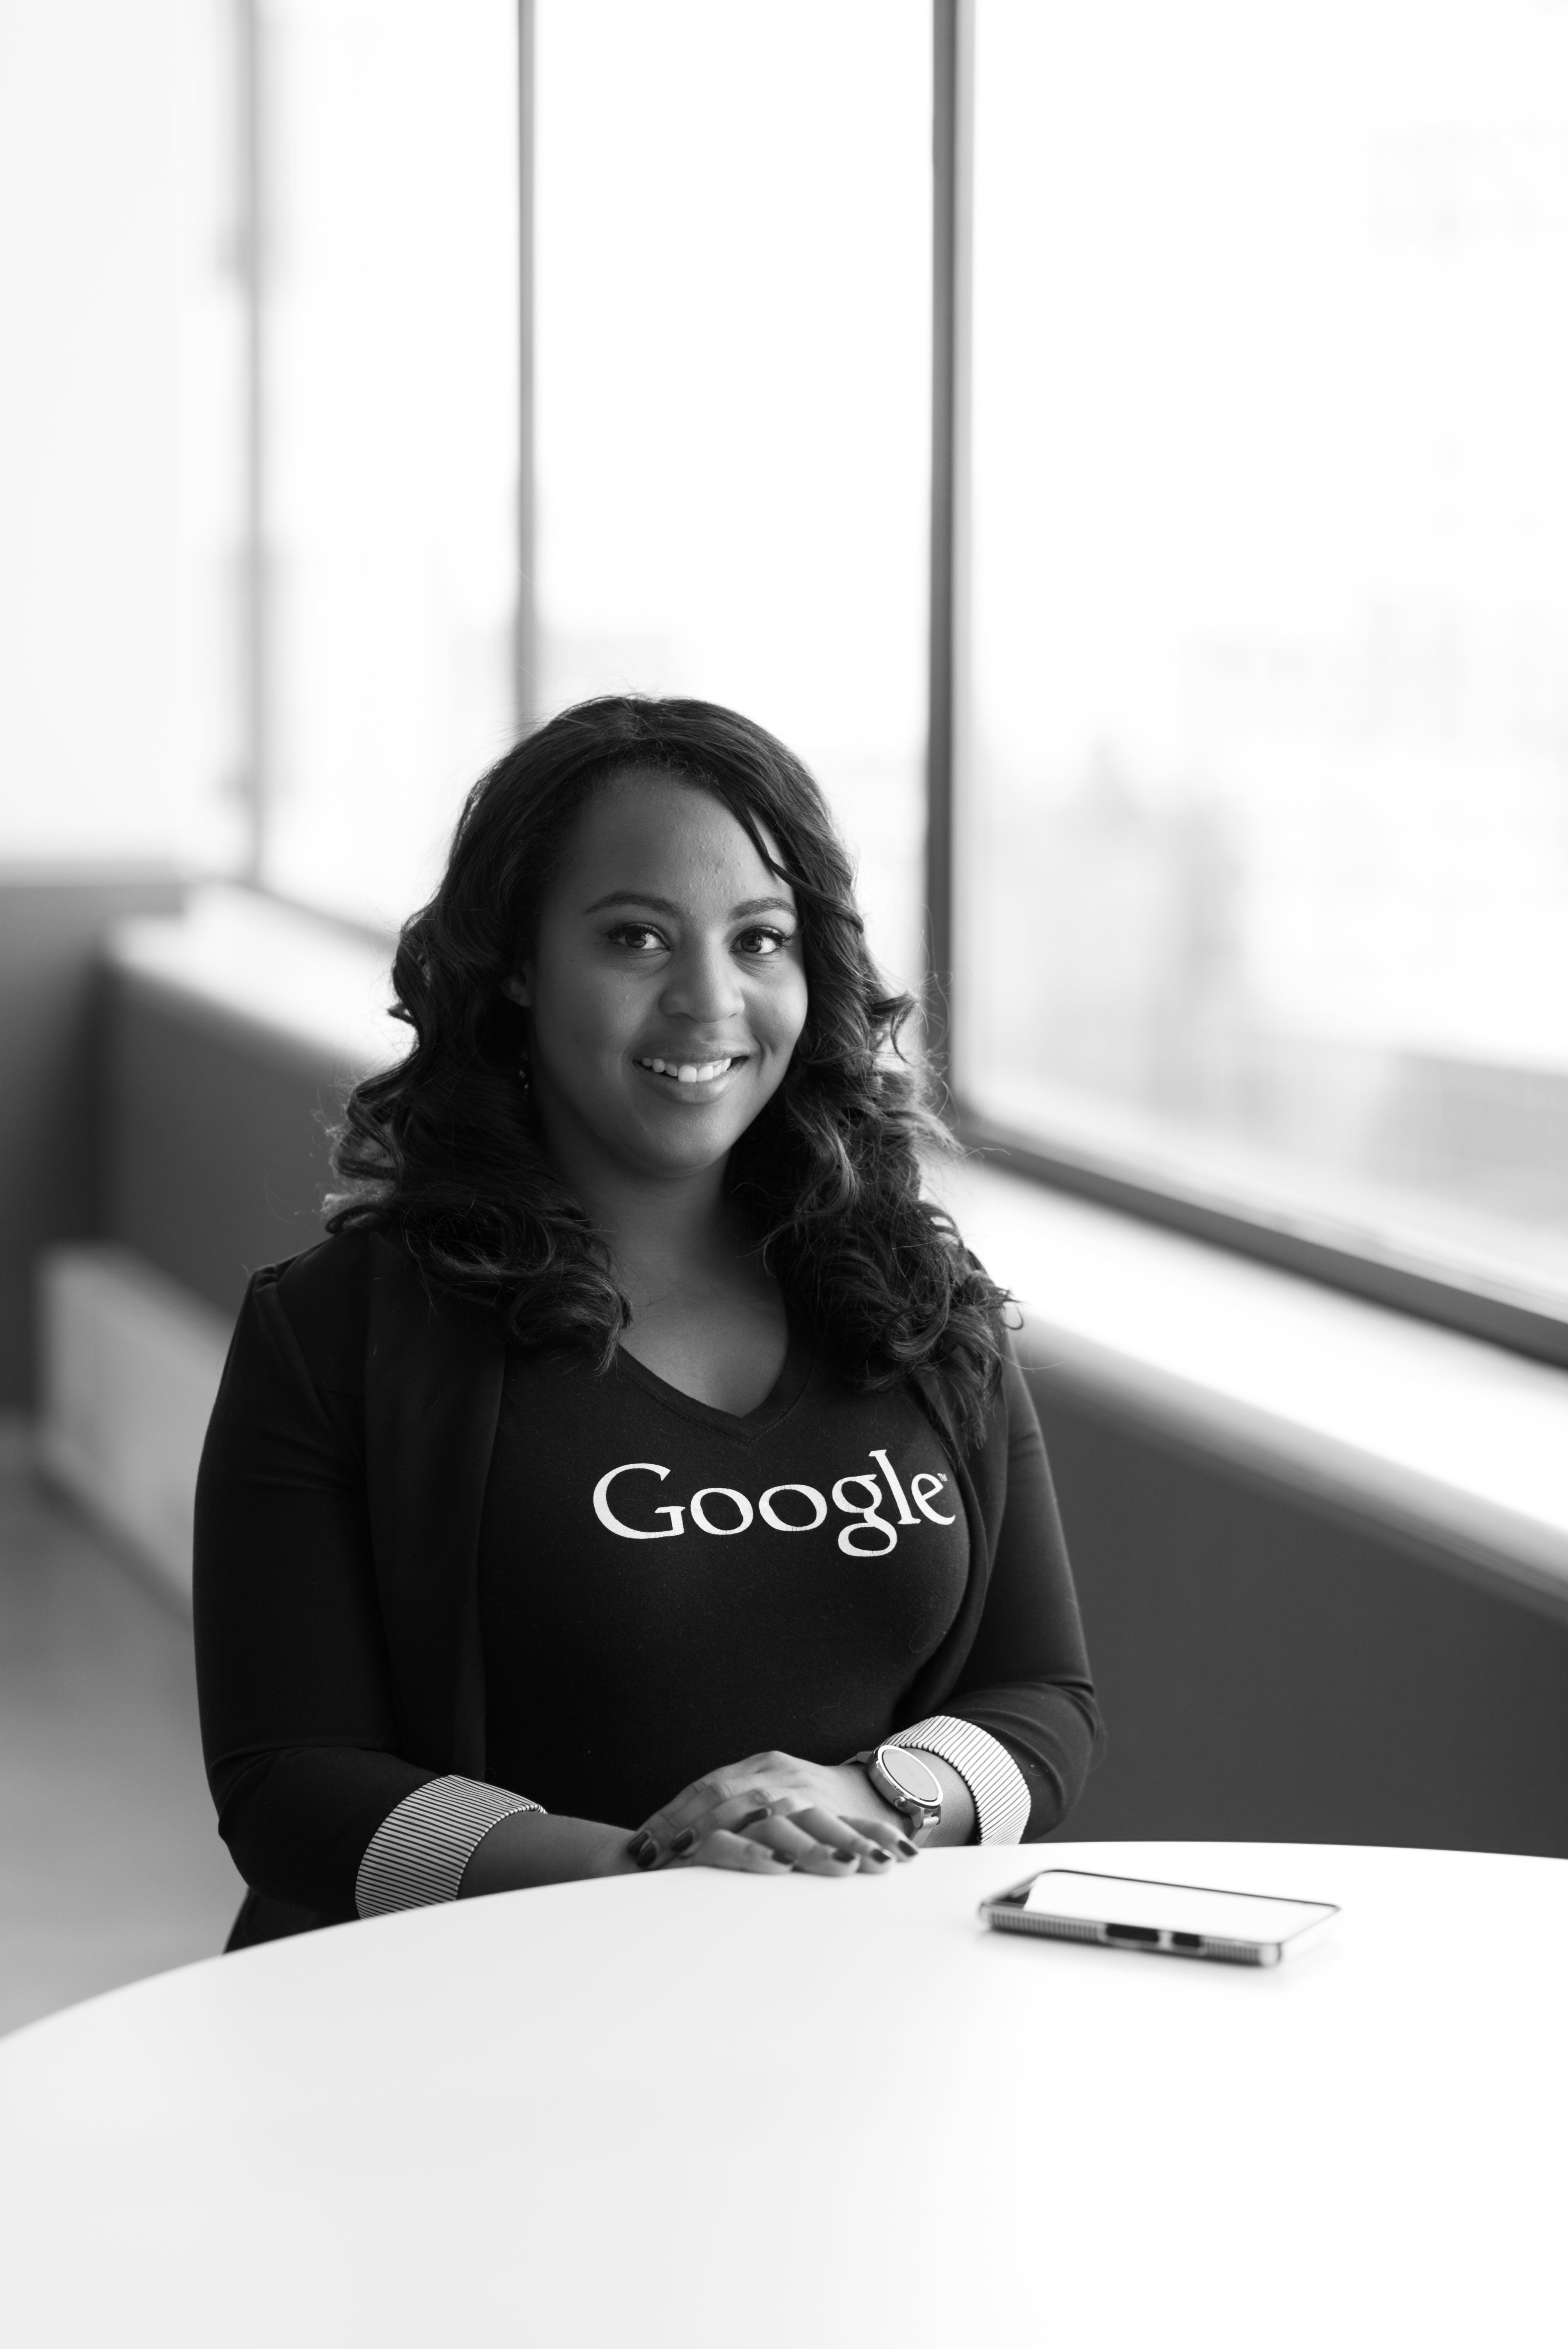 Woman Wearing Google-printed Shirt